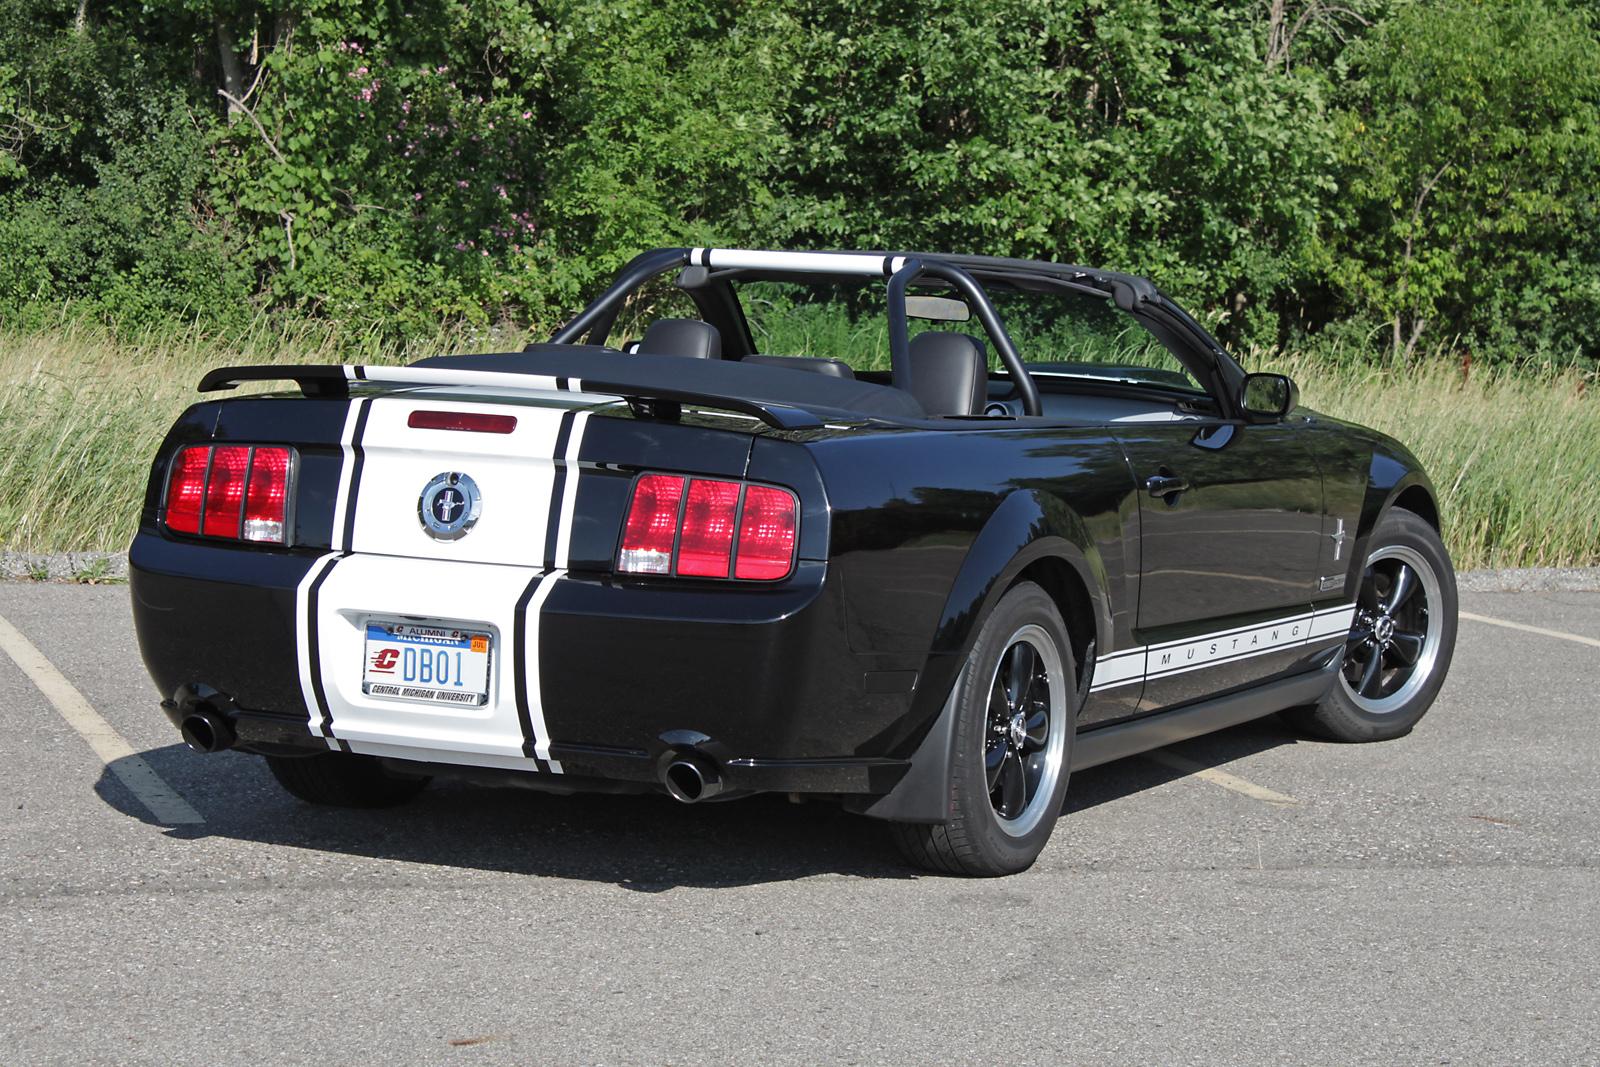 Click image for larger version  Name:Jim Carolan Mustang 7a.jpg Views:82 Size:1.07 MB ID:35811